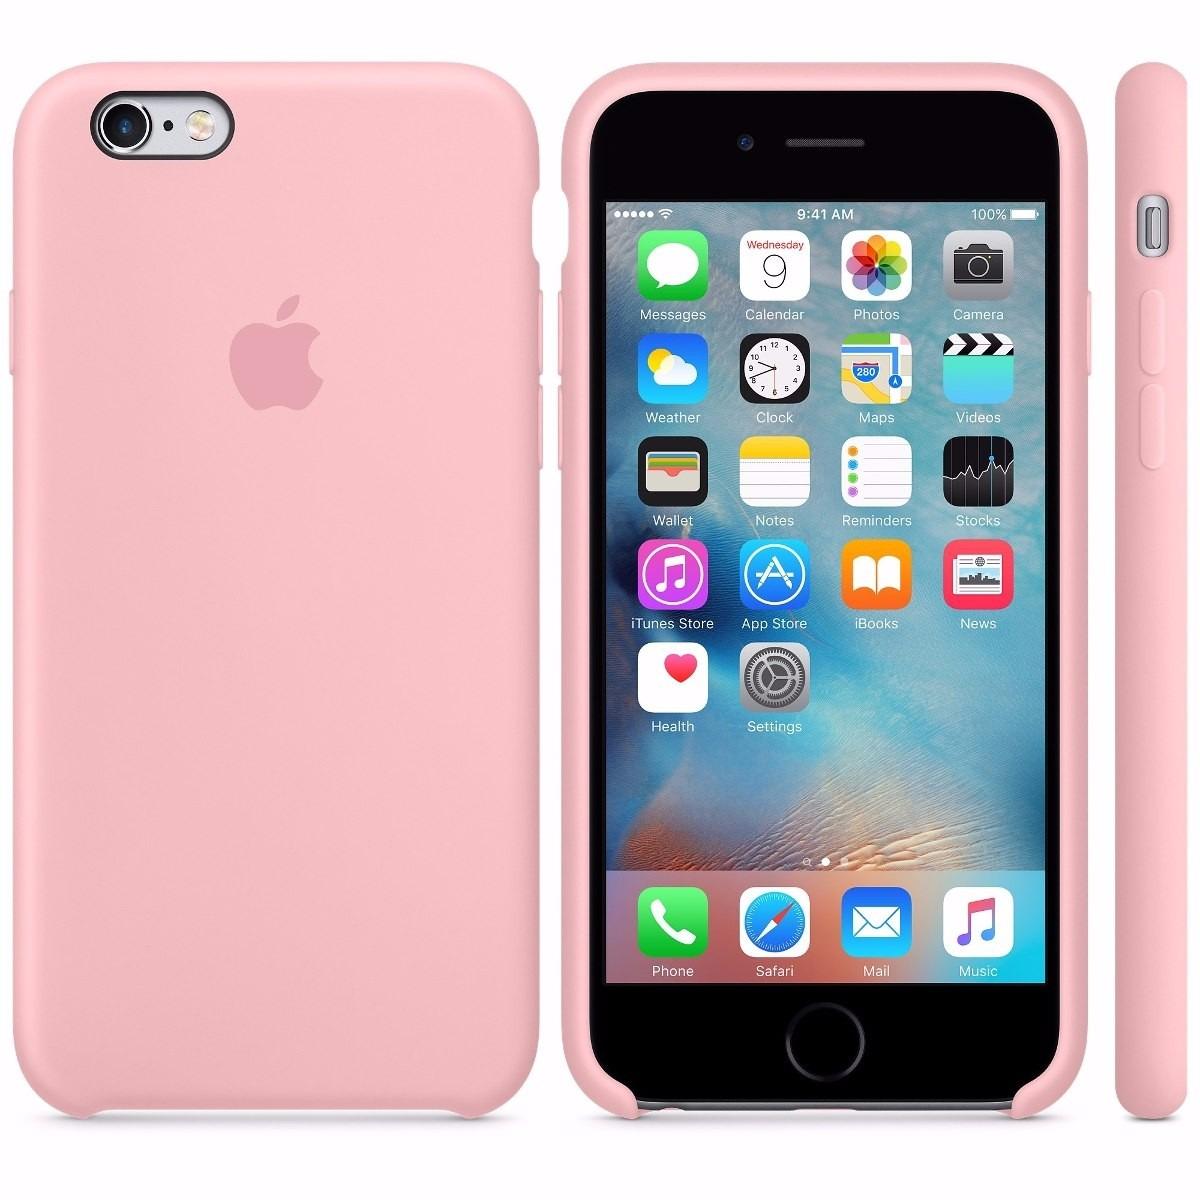 6d9ddc23c Capa Capinha Silicone Couro Celular Apple Iphone 6 E 6s 4